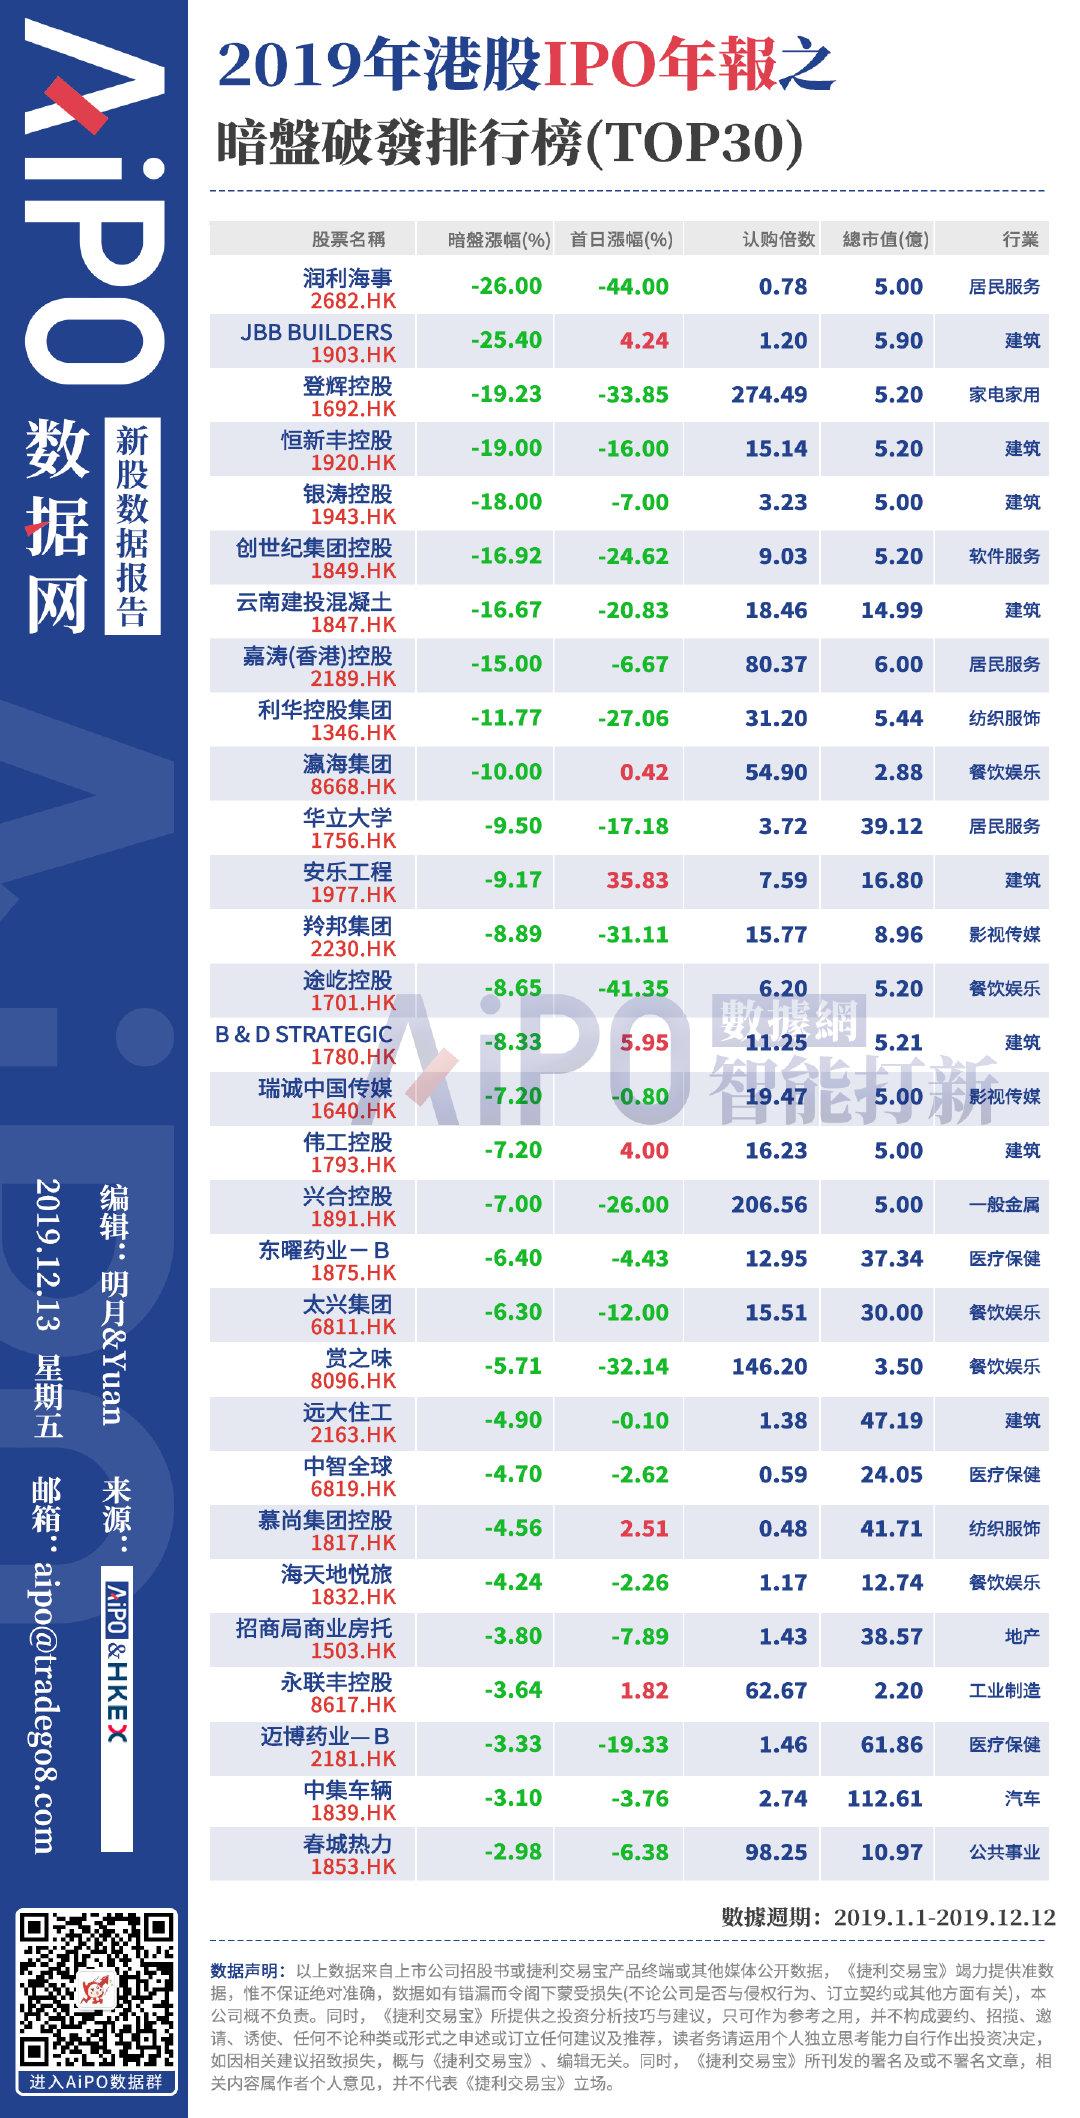 2019年港股IPO年报